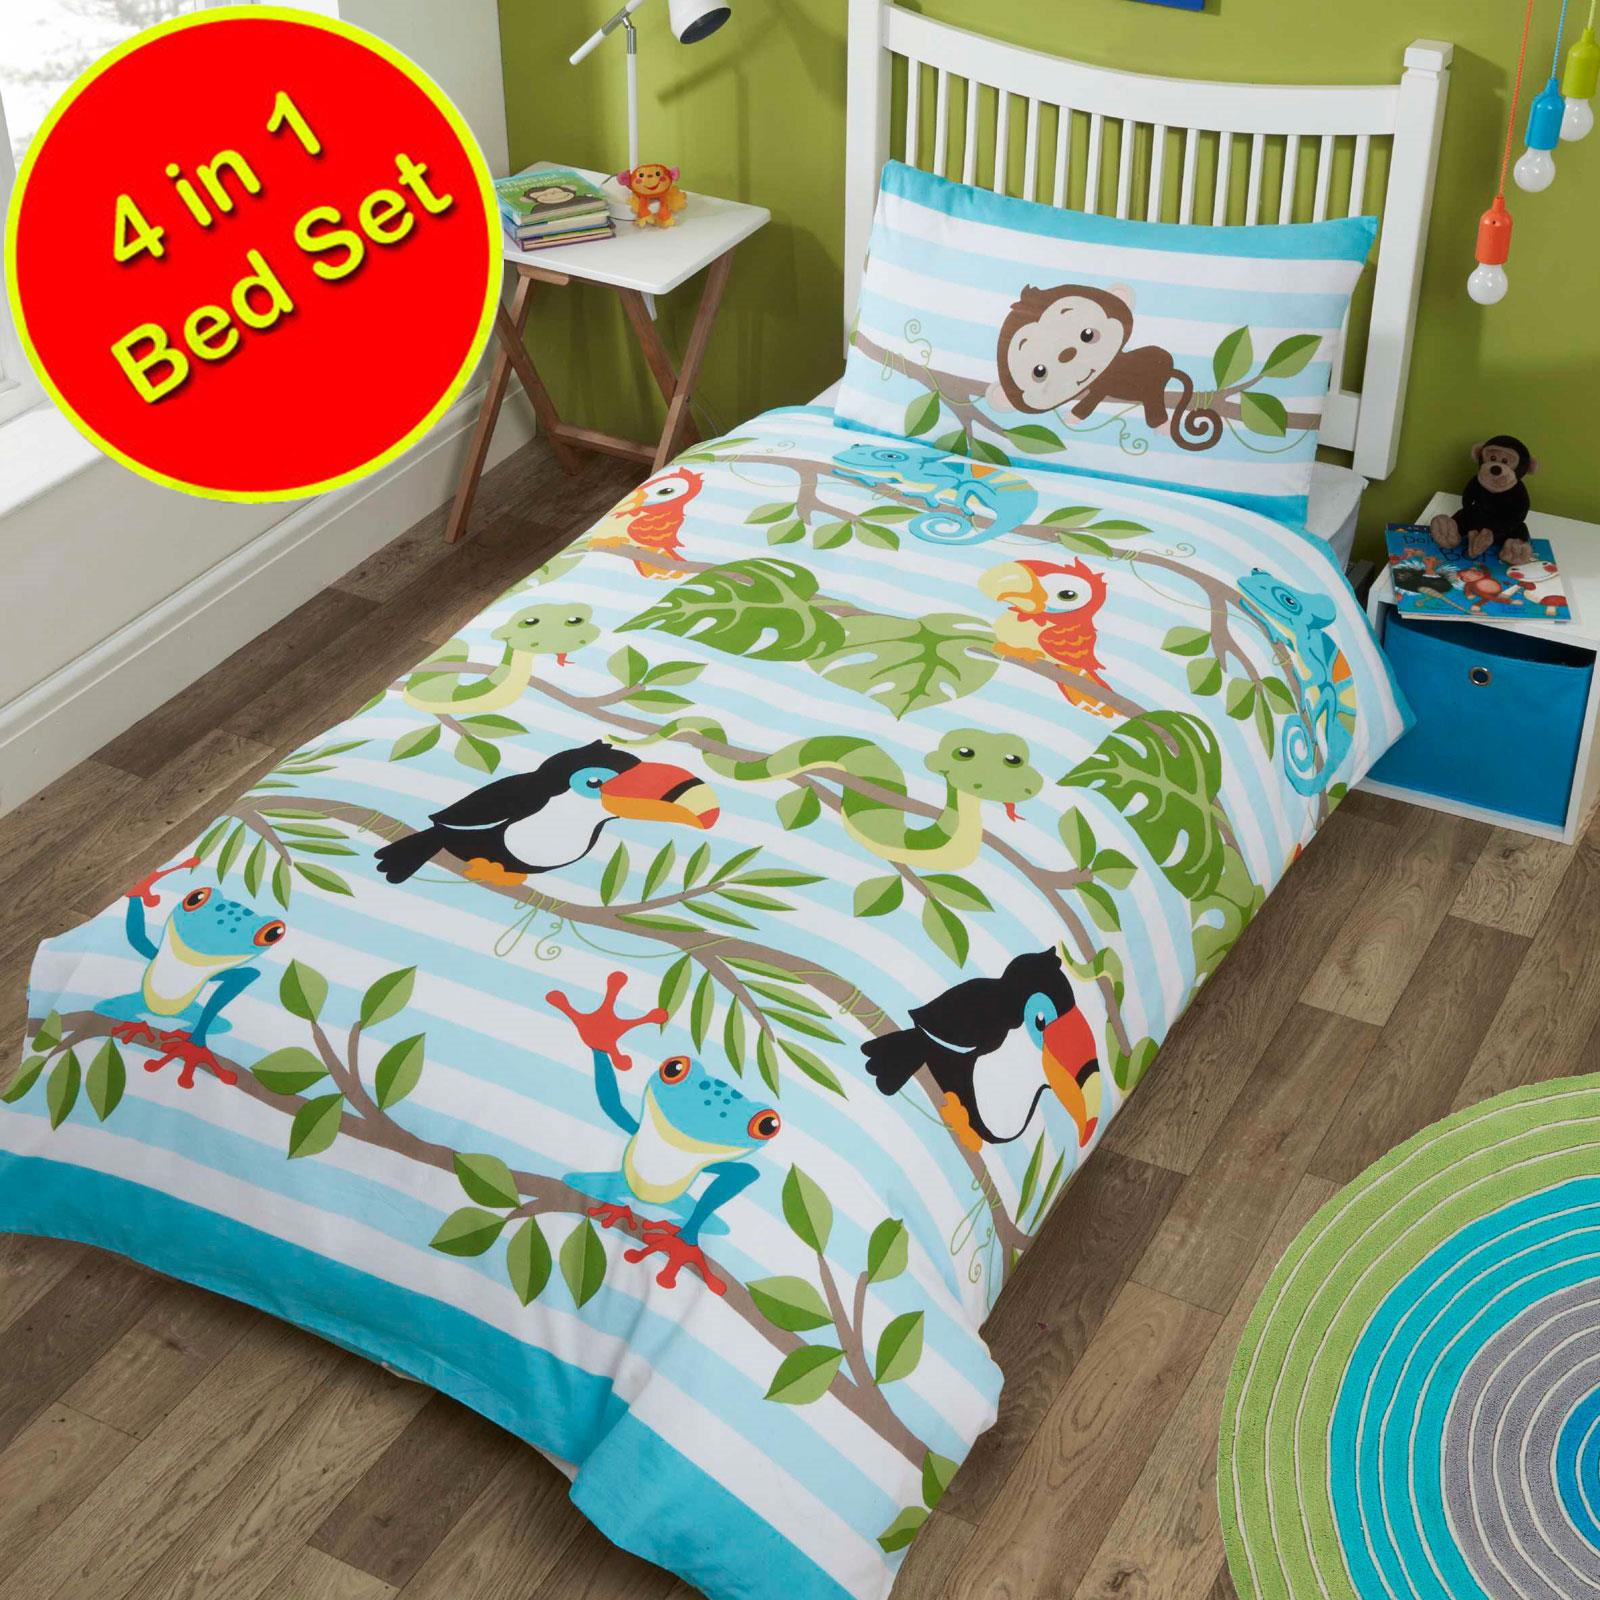 4 In 1 Junior Toddler Bedding Set Duvet Cover Quilt Pillow Blue Pink Character